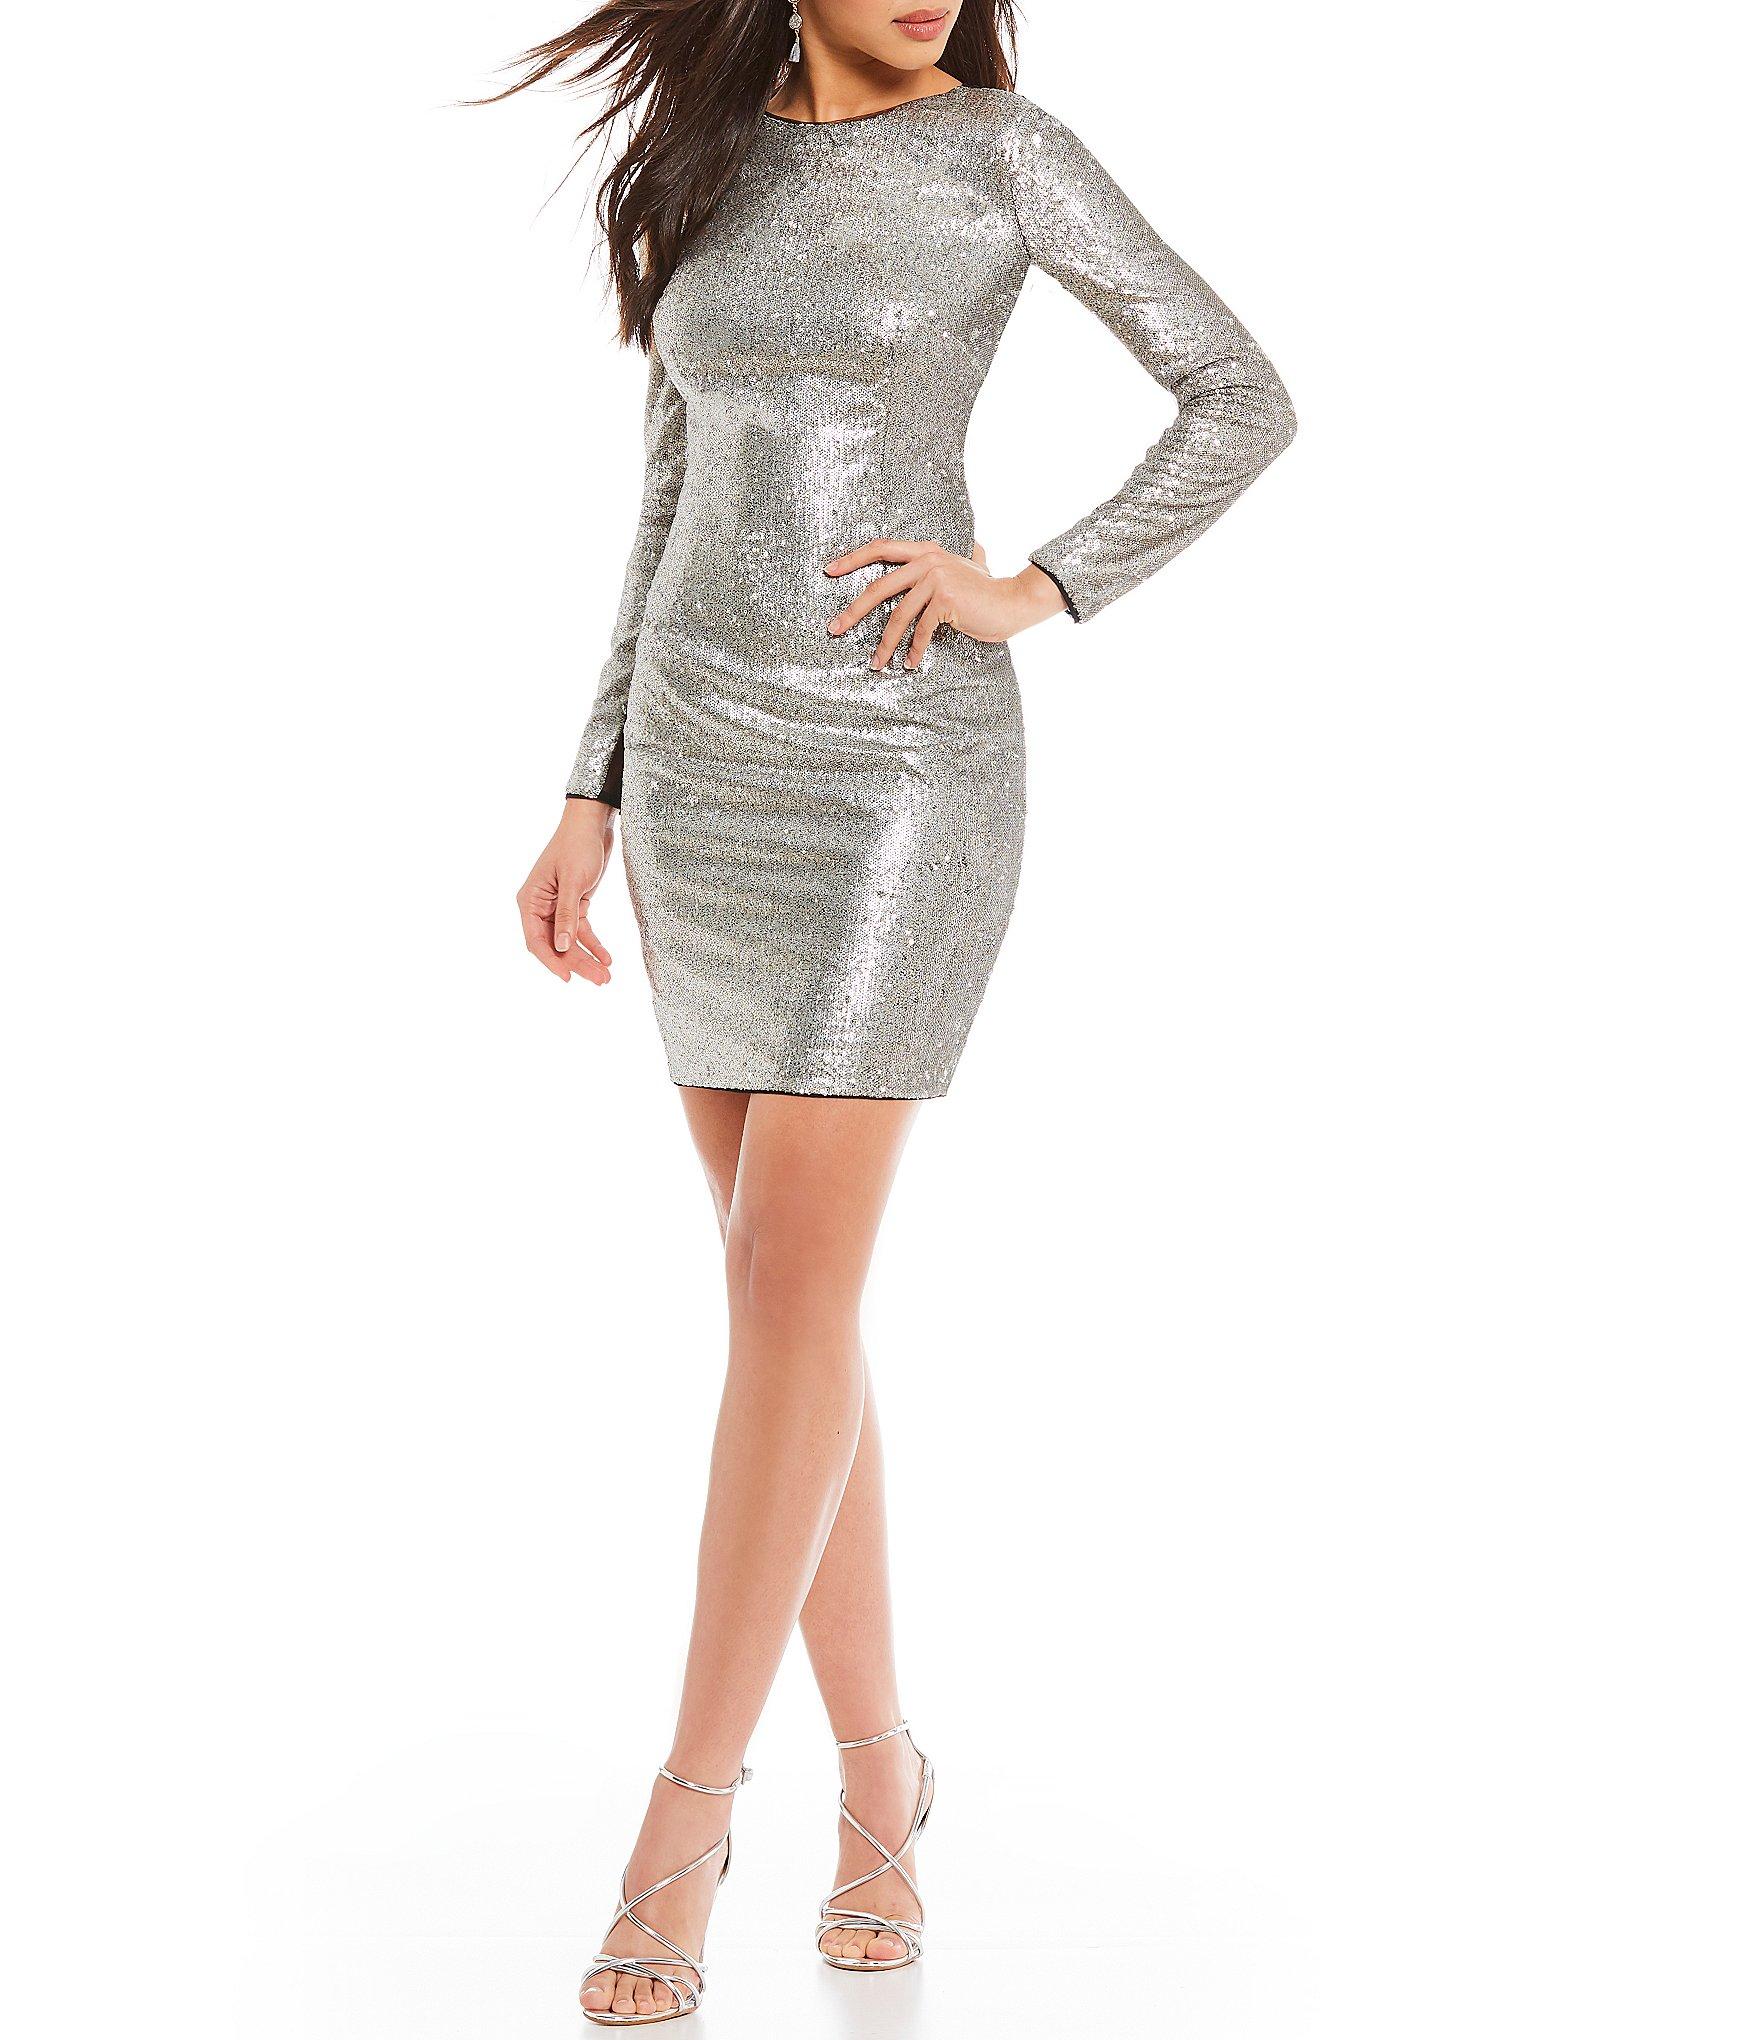 3ddf687d114 Gold Formal Dresses Dillards